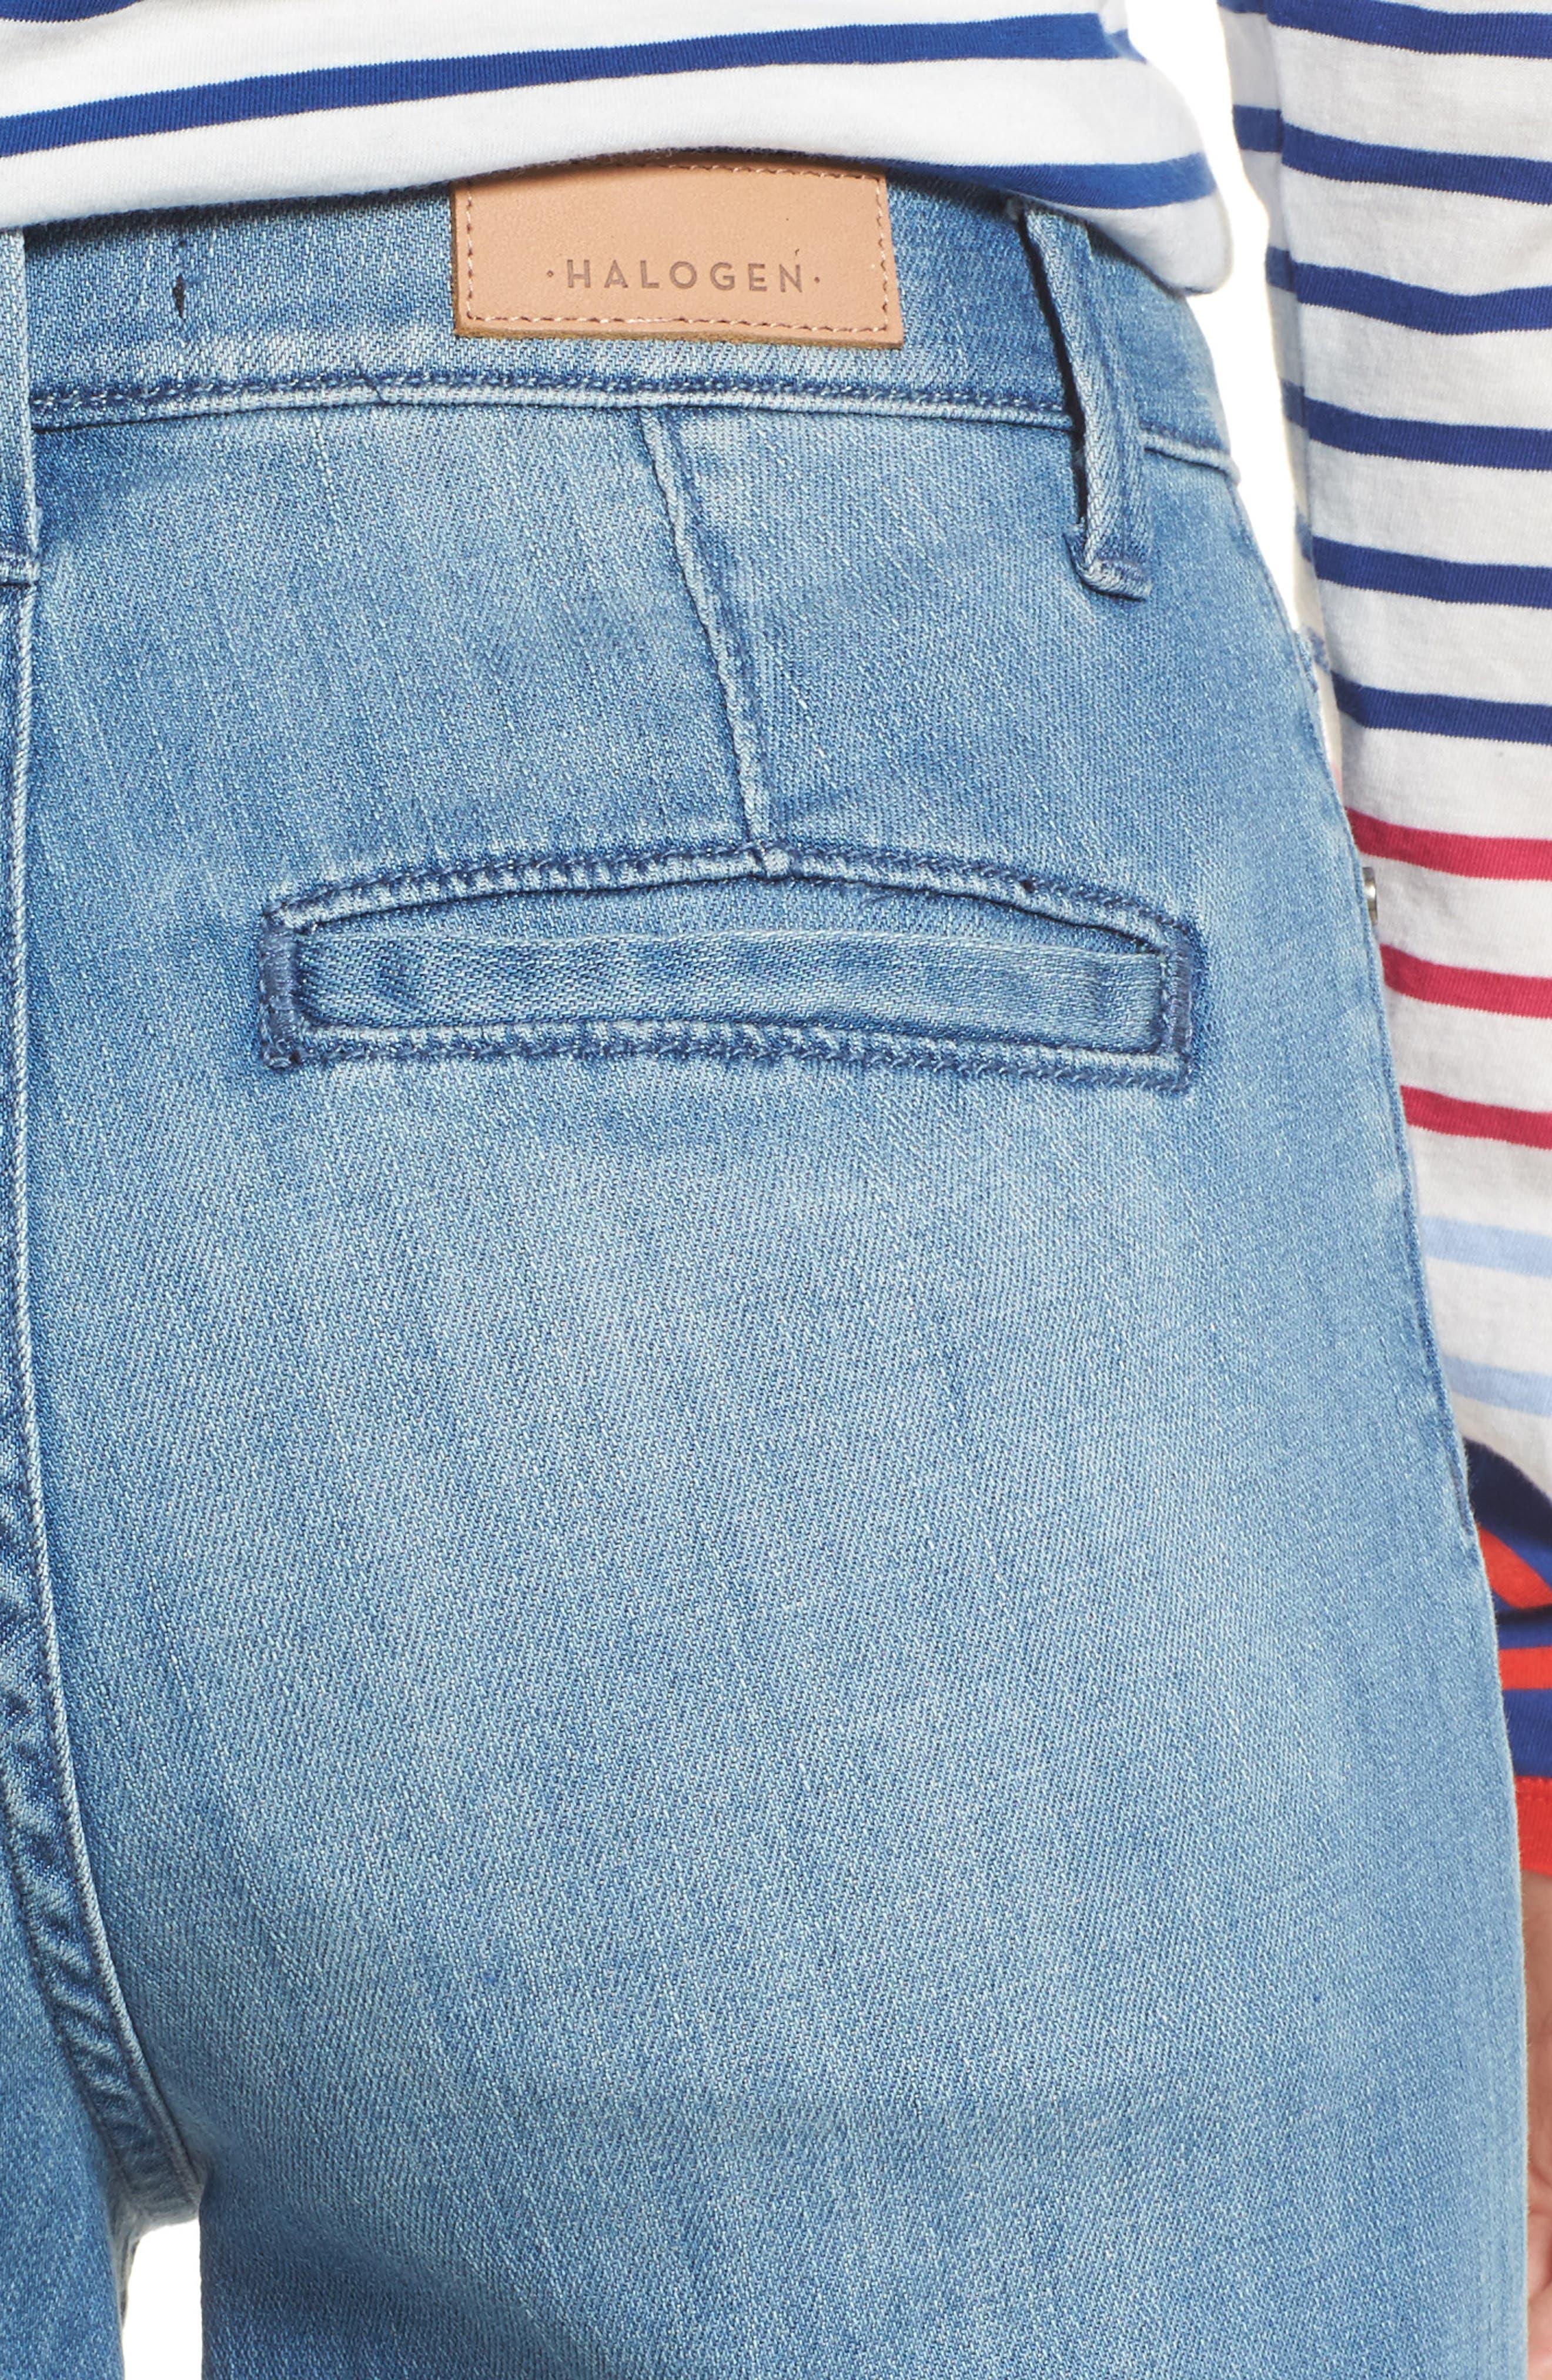 Wide Leg Cropped Jeans,                             Alternate thumbnail 4, color,